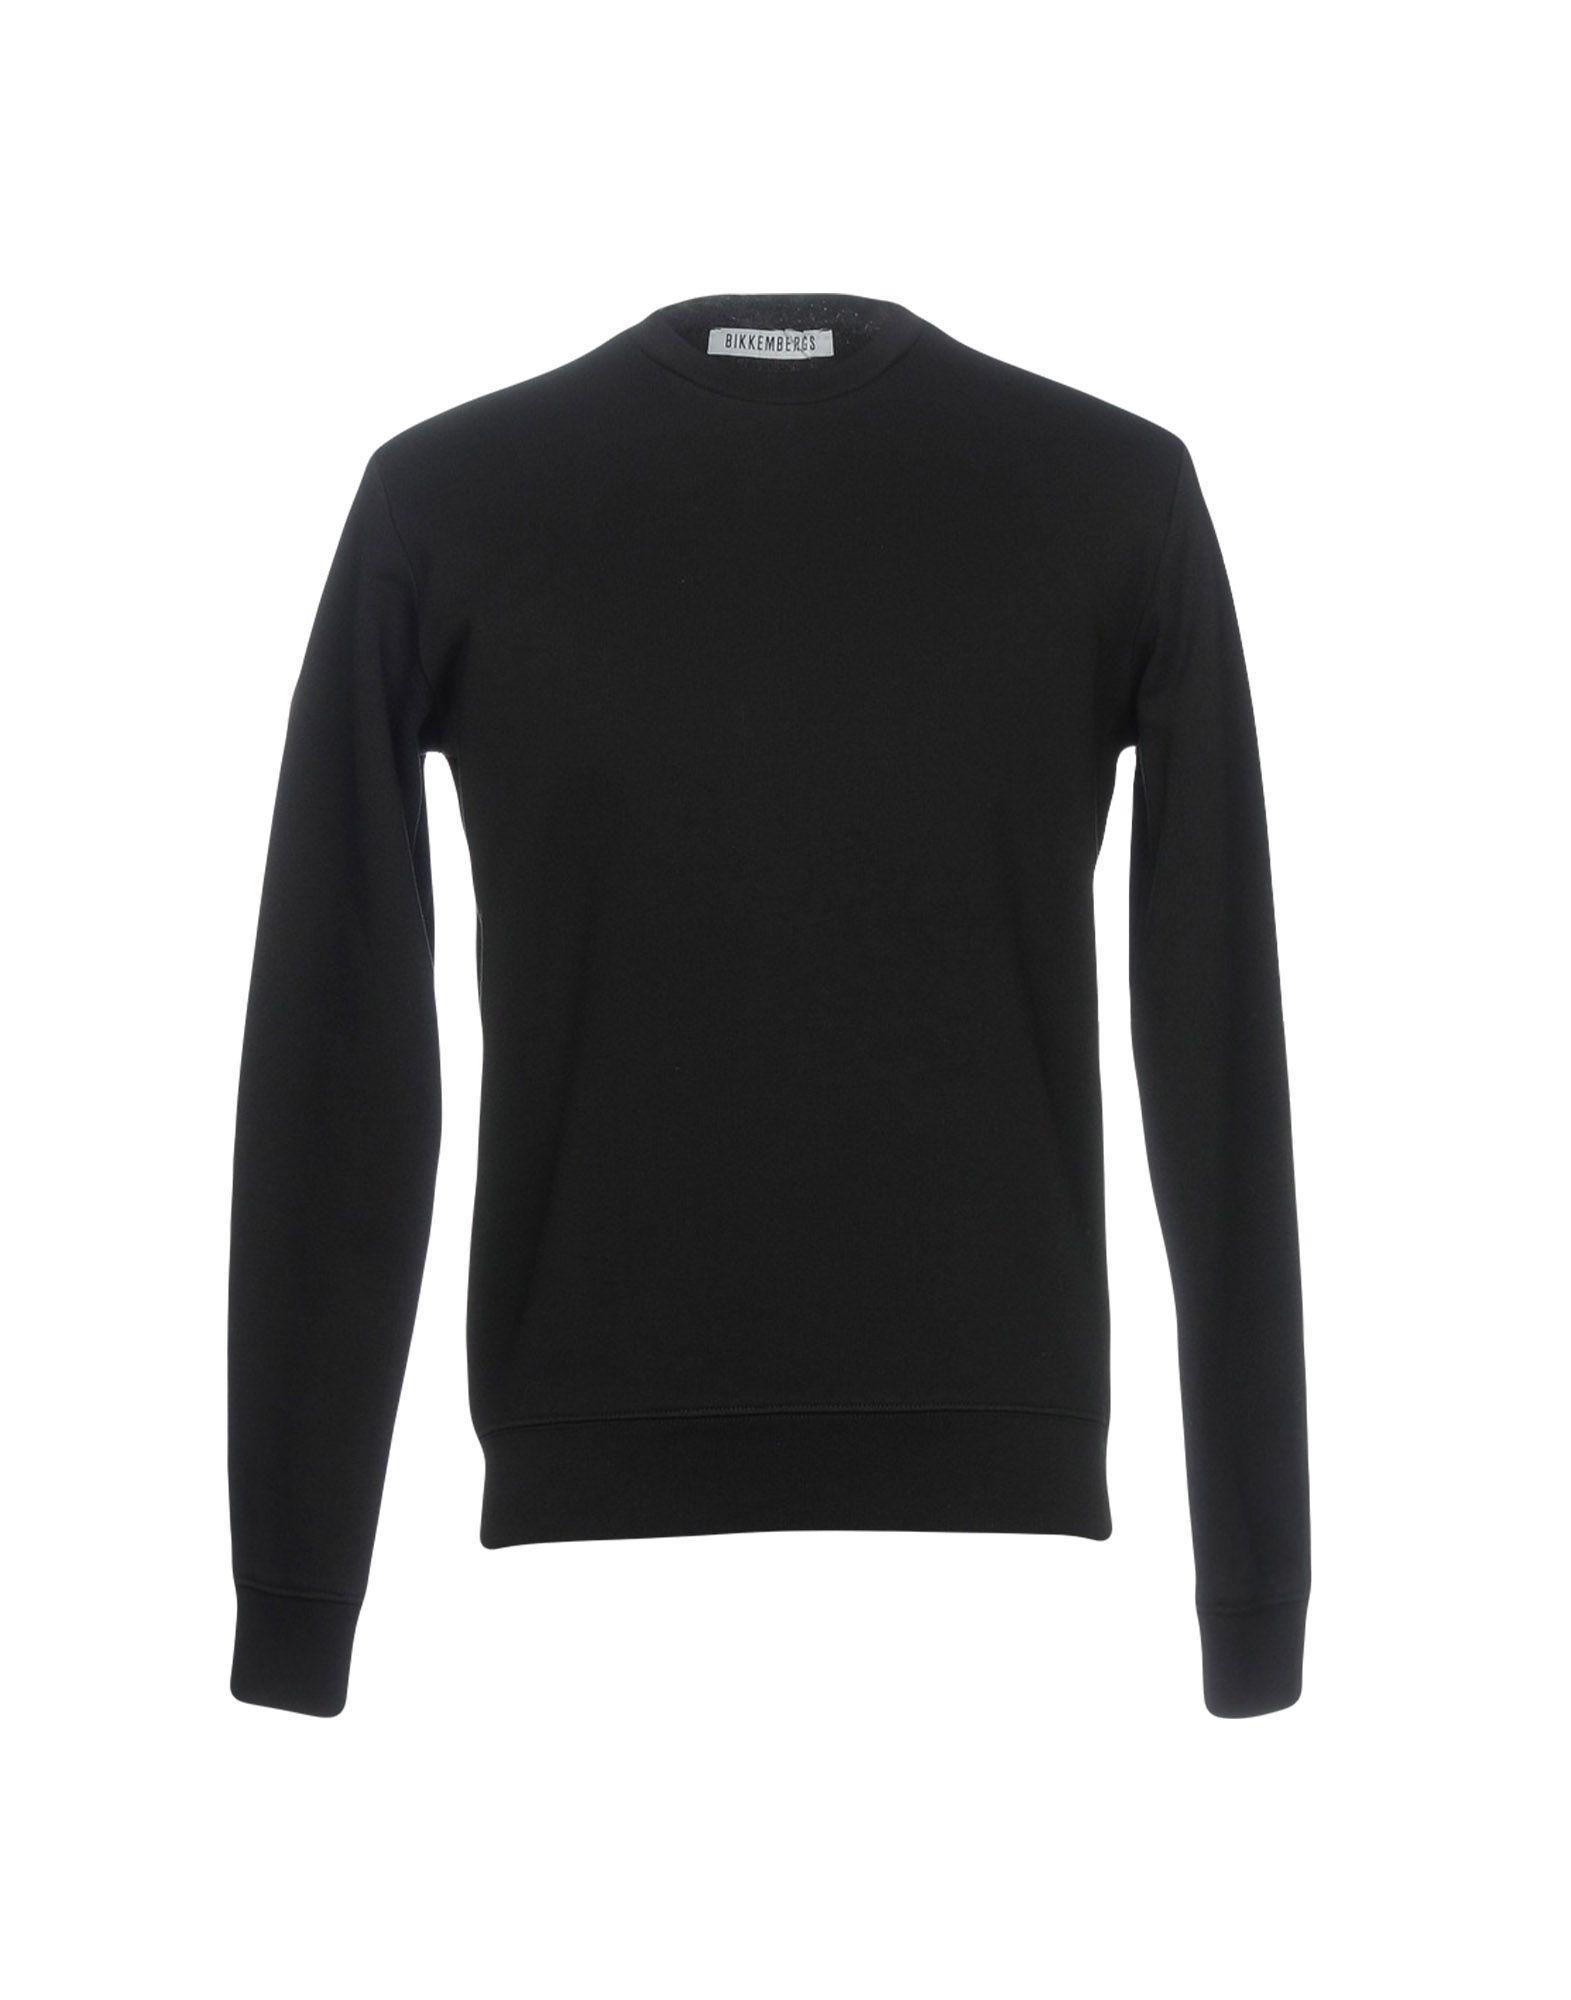 Bikkembergs Sweatshirt In Black